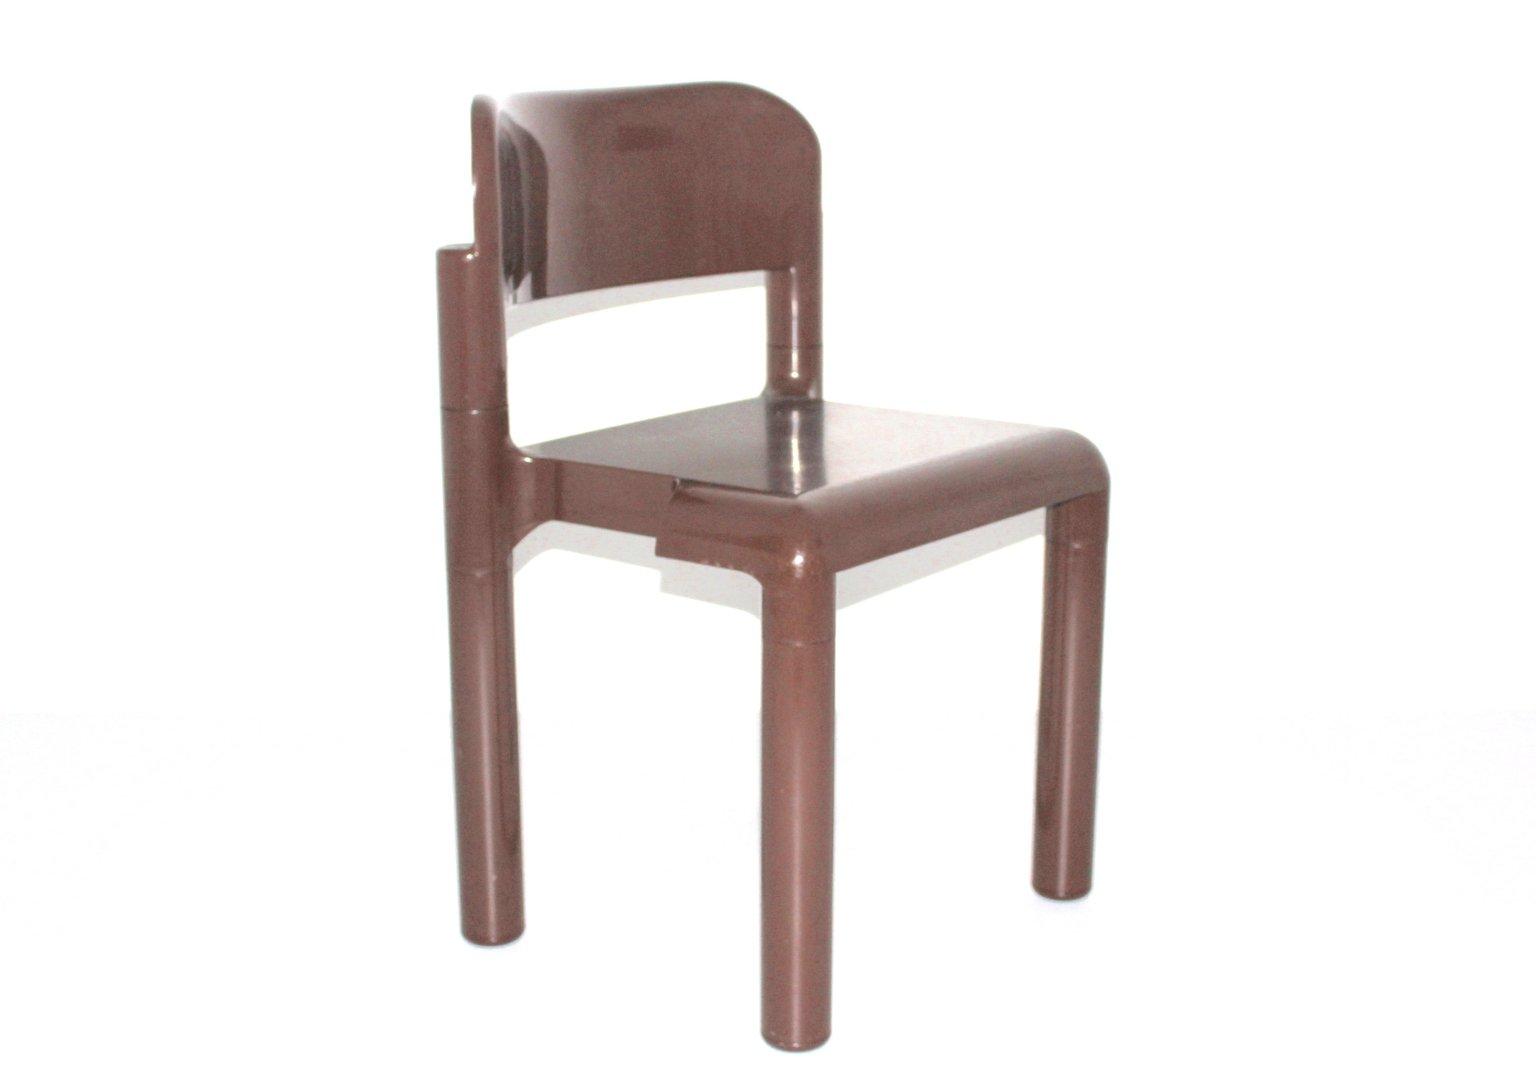 brauner stuhl aus plastik von eerio aarnio f r upo. Black Bedroom Furniture Sets. Home Design Ideas